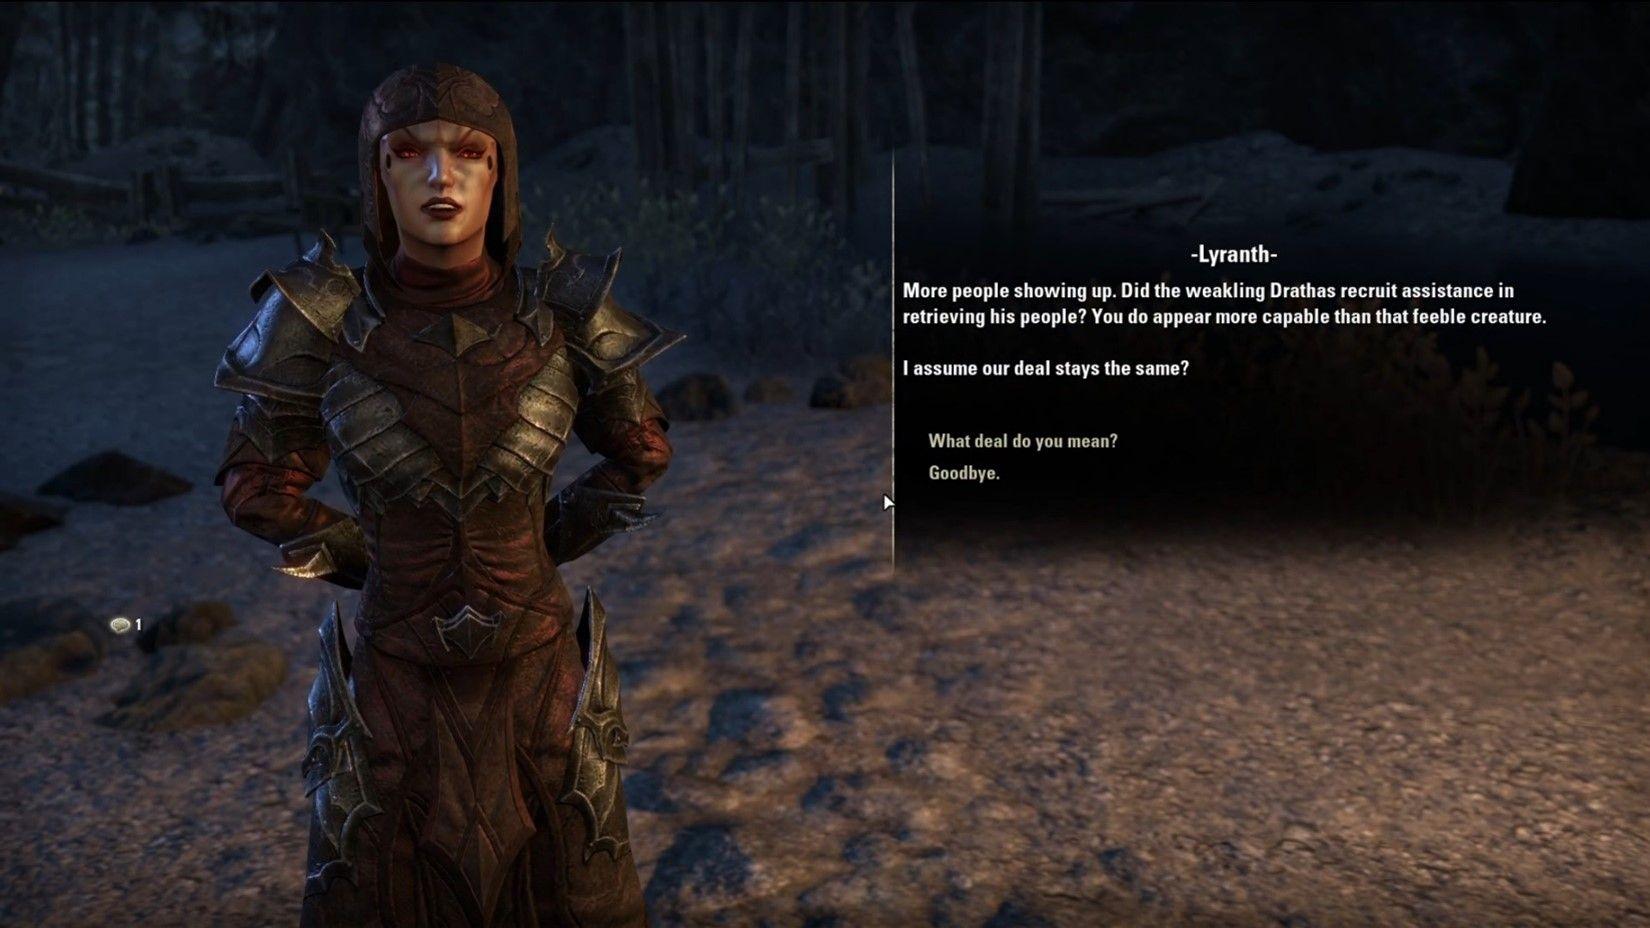 Lyranth The Elder Scrolls Online